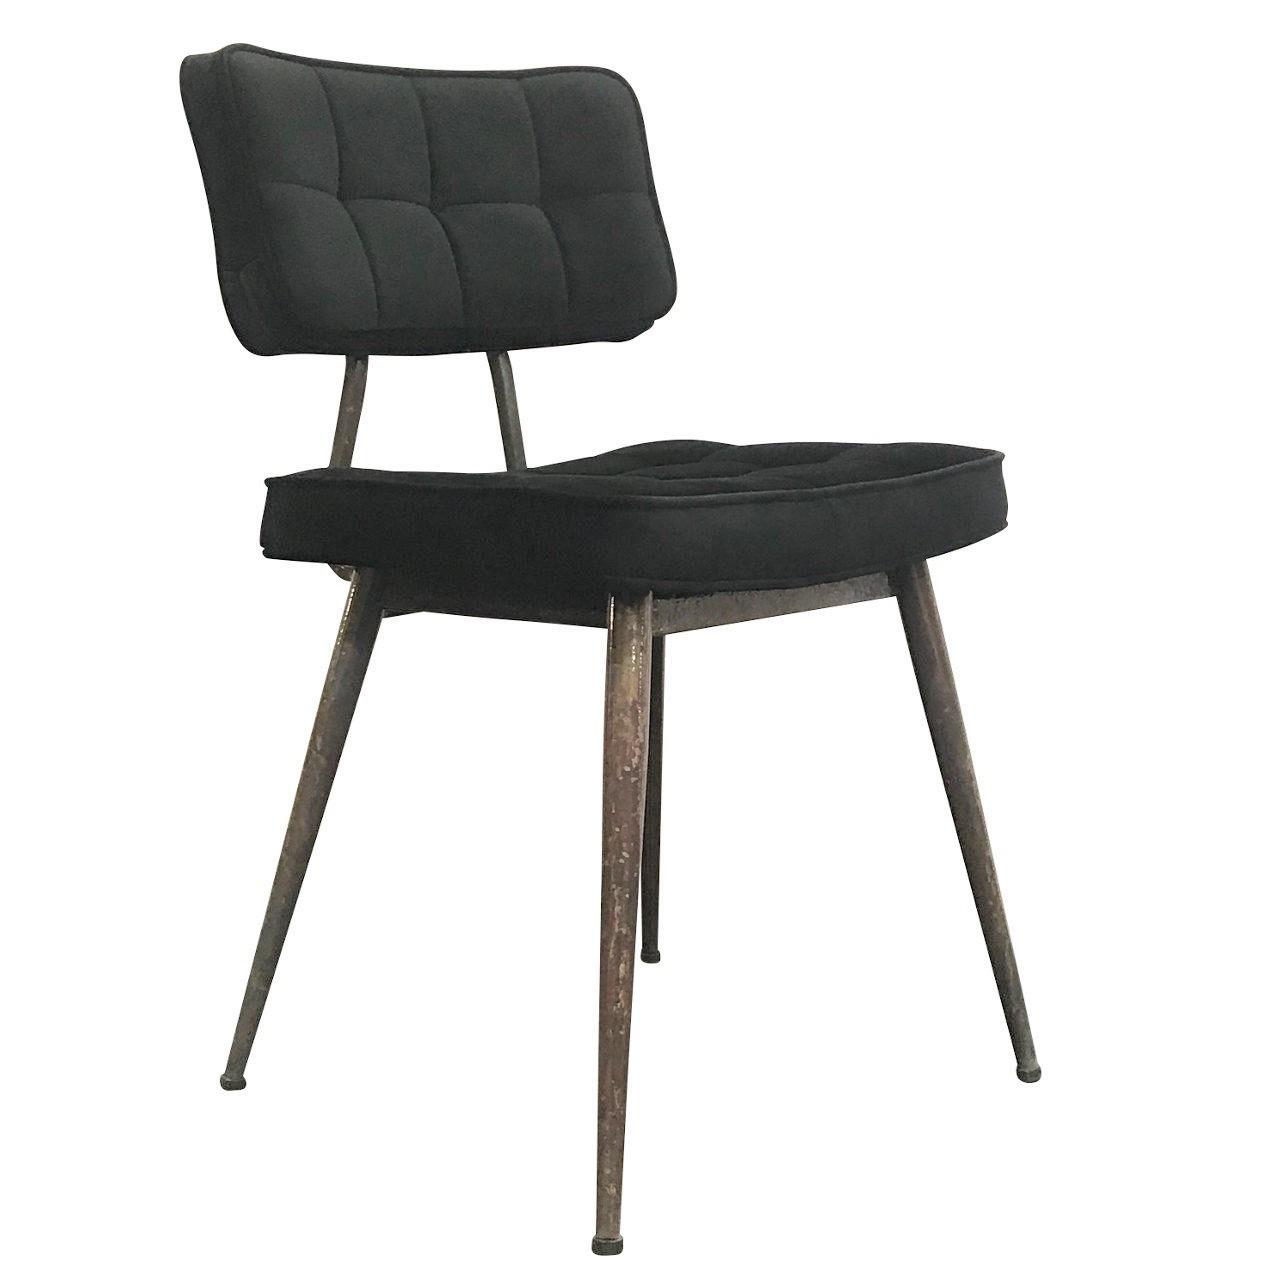 felix-F side-chair_1